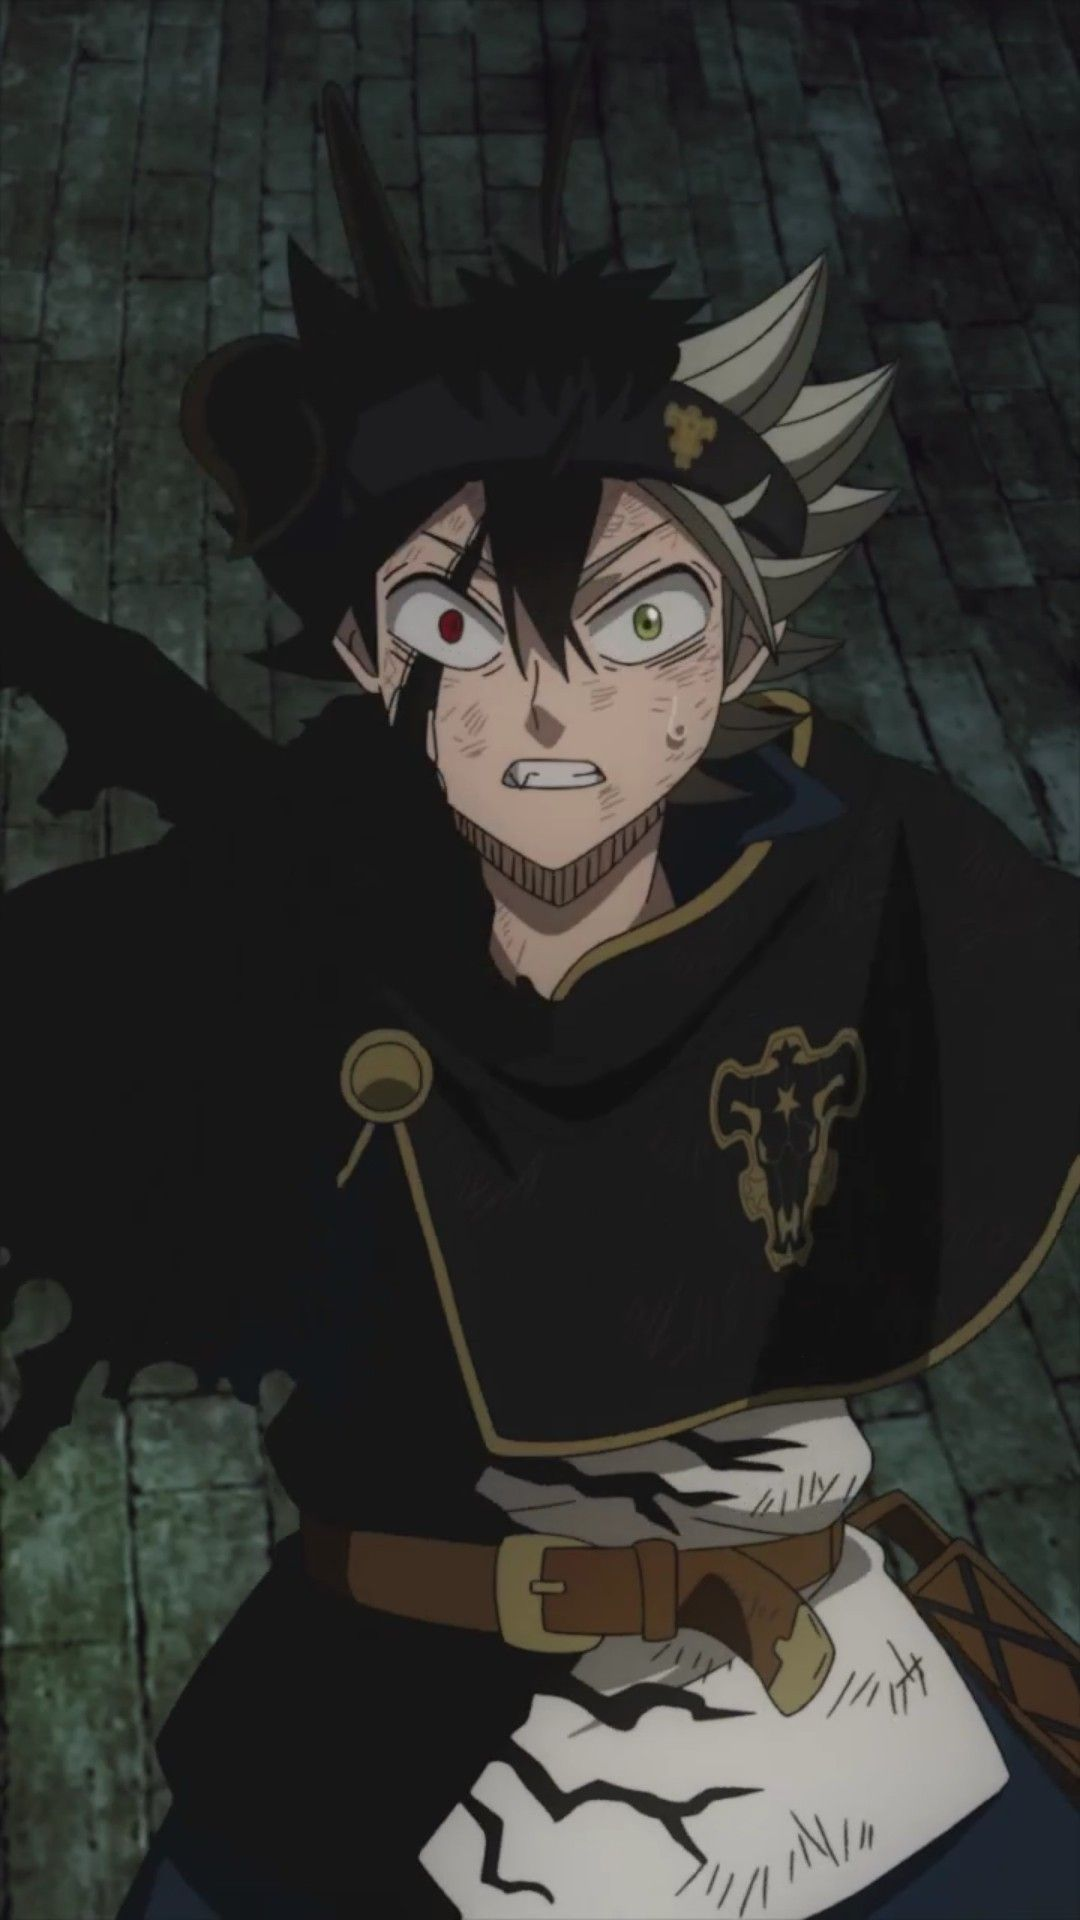 Asta Demon Form Black Clover Black Clover Anime Anime Wallpaper Naruto Uzumaki Art